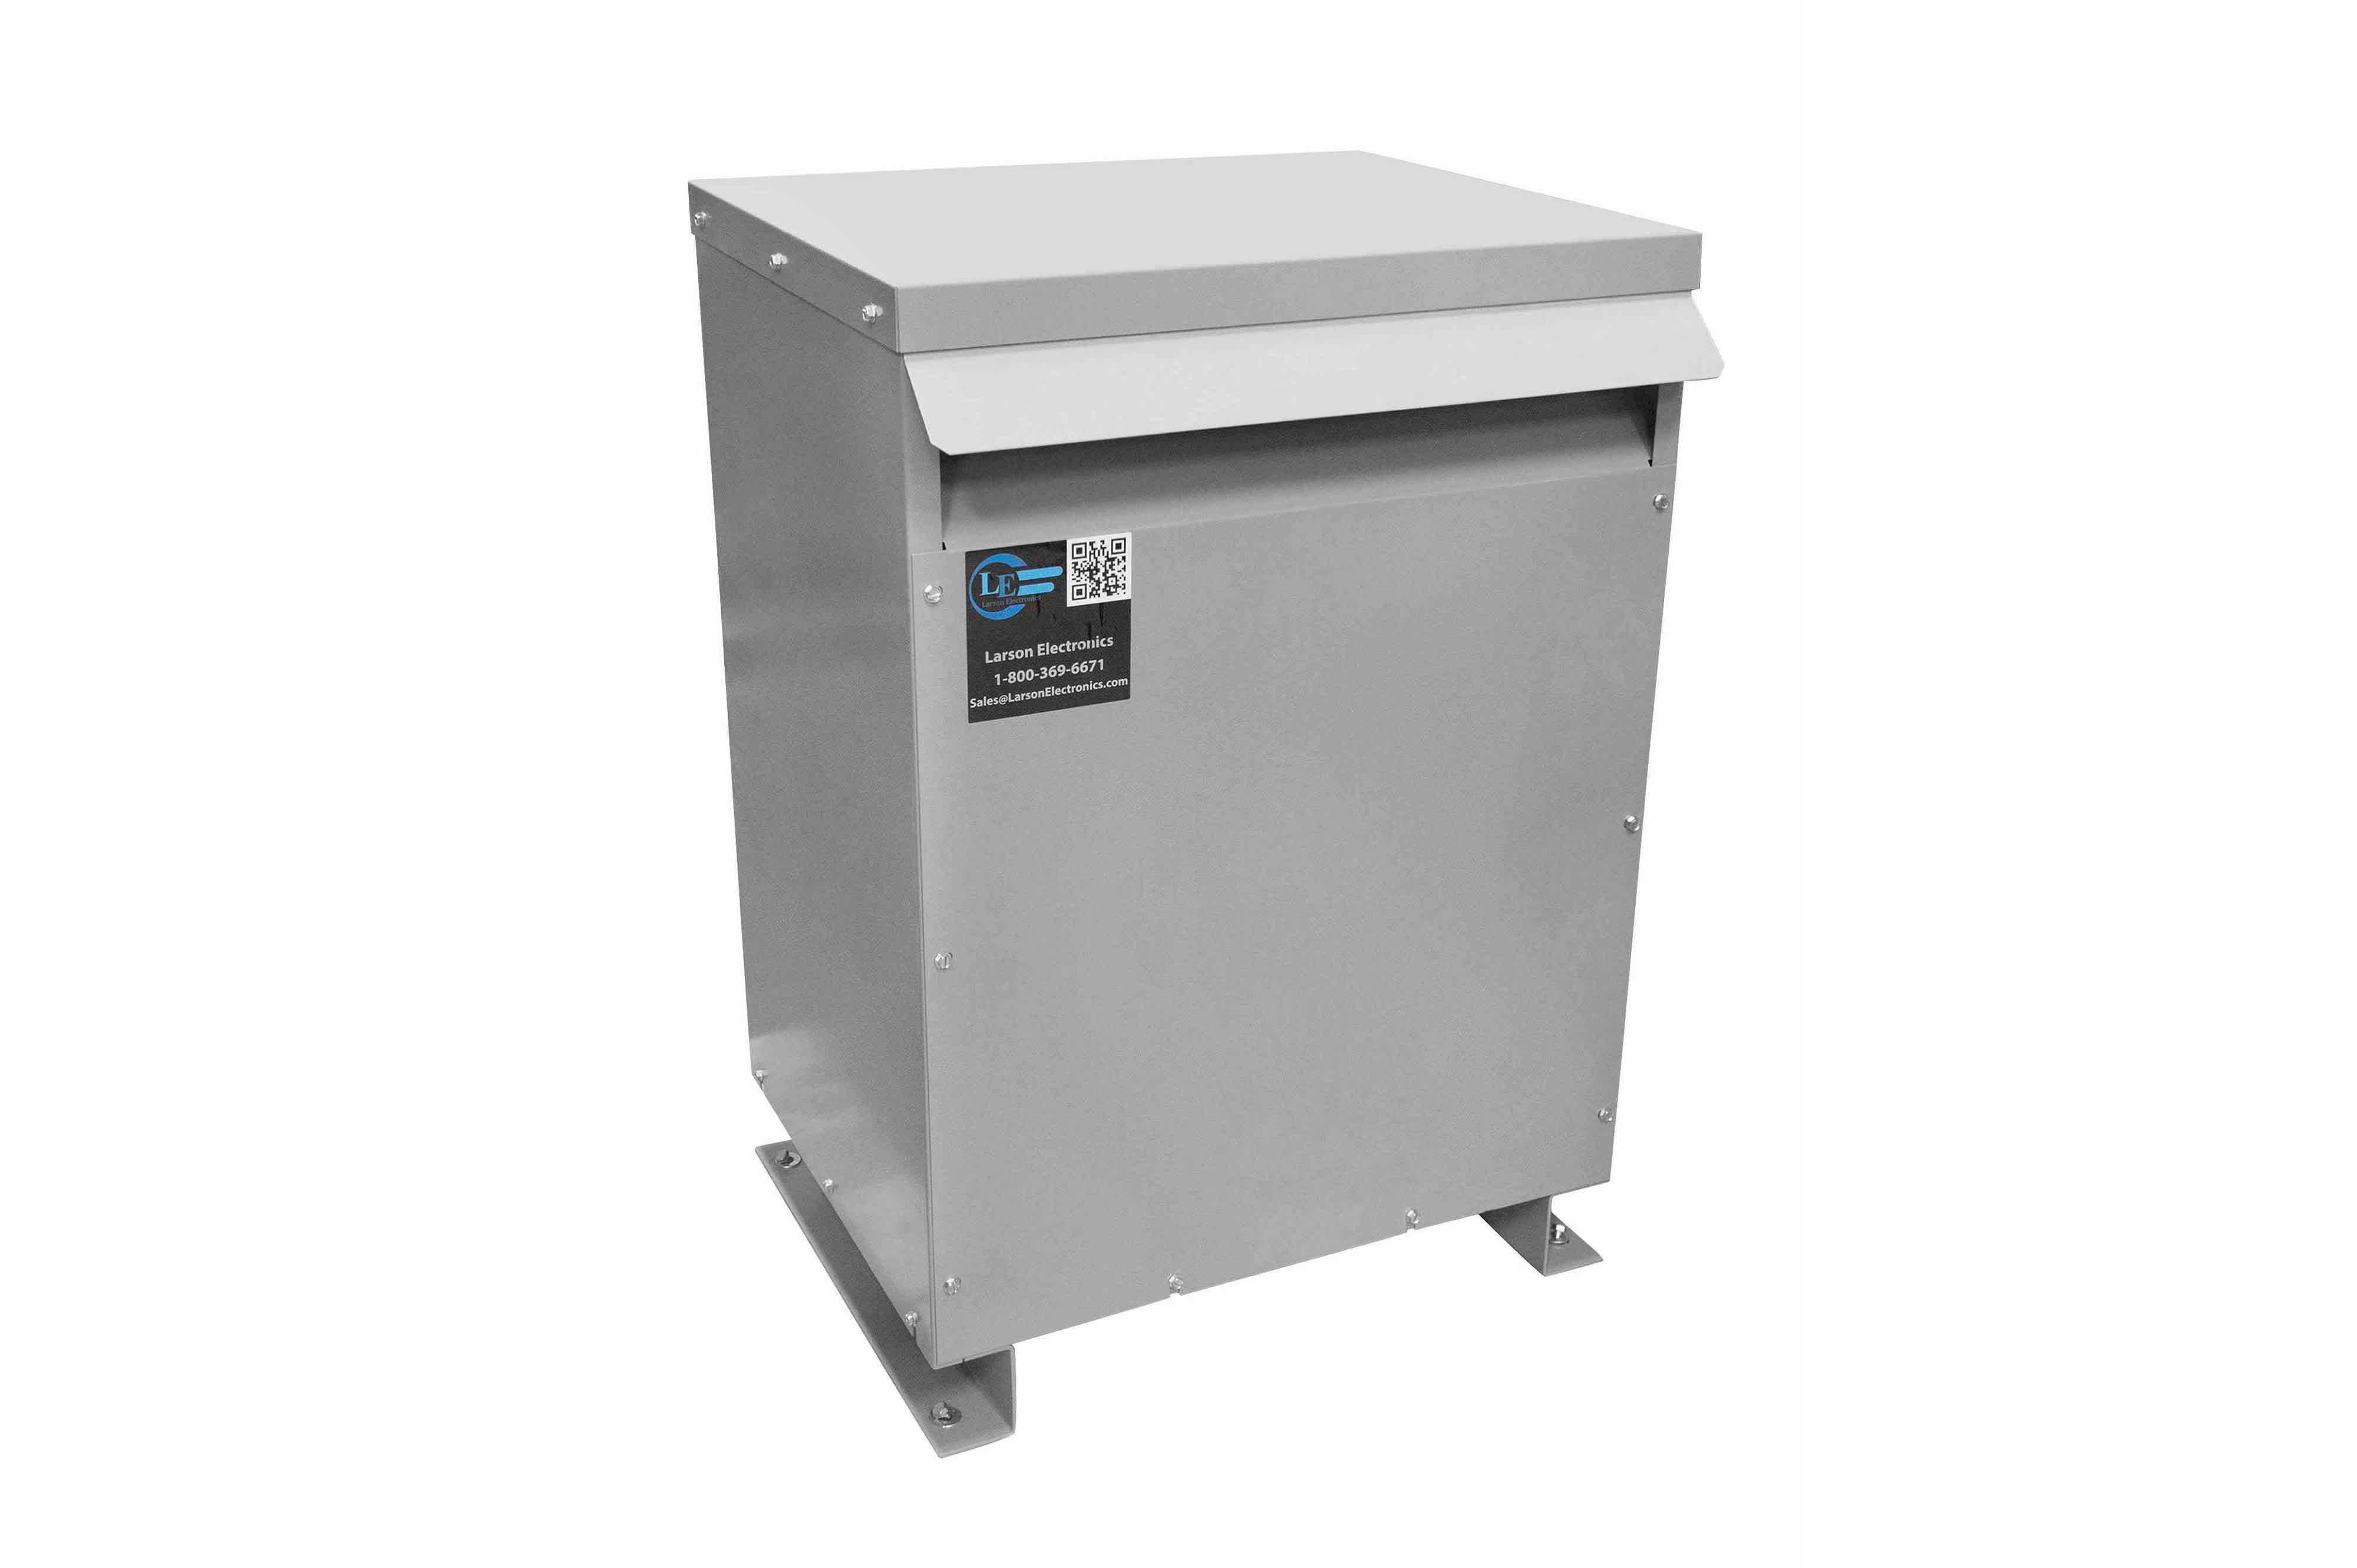 38 kVA 3PH Isolation Transformer, 575V Wye Primary, 208V Delta Secondary, N3R, Ventilated, 60 Hz